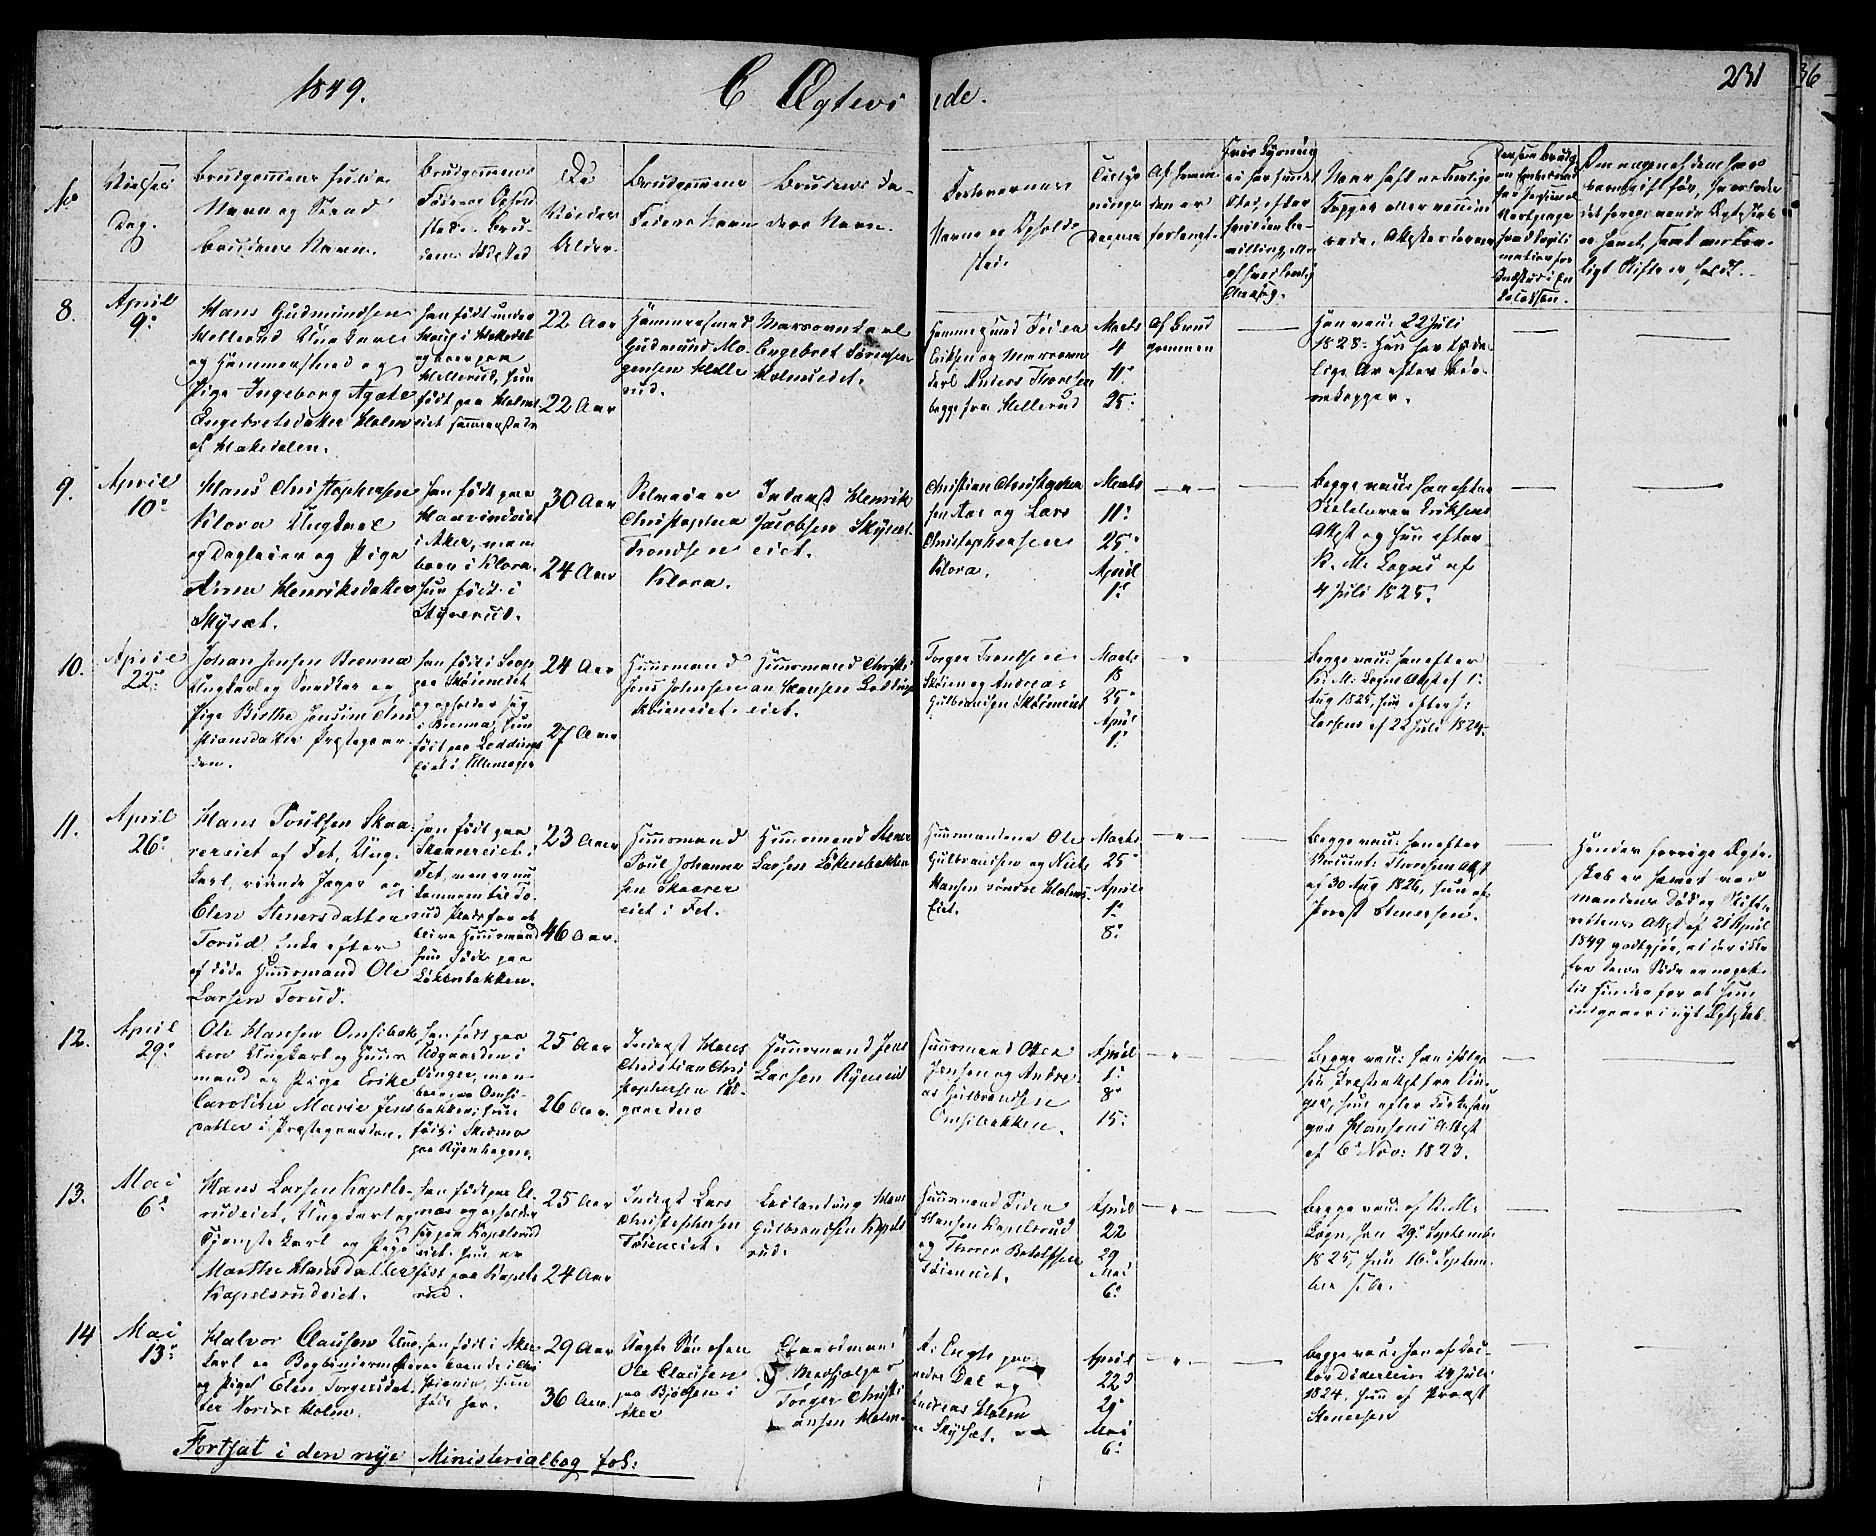 SAO, Nittedal prestekontor Kirkebøker, F/Fa/L0004: Ministerialbok nr. I 4, 1836-1849, s. 231